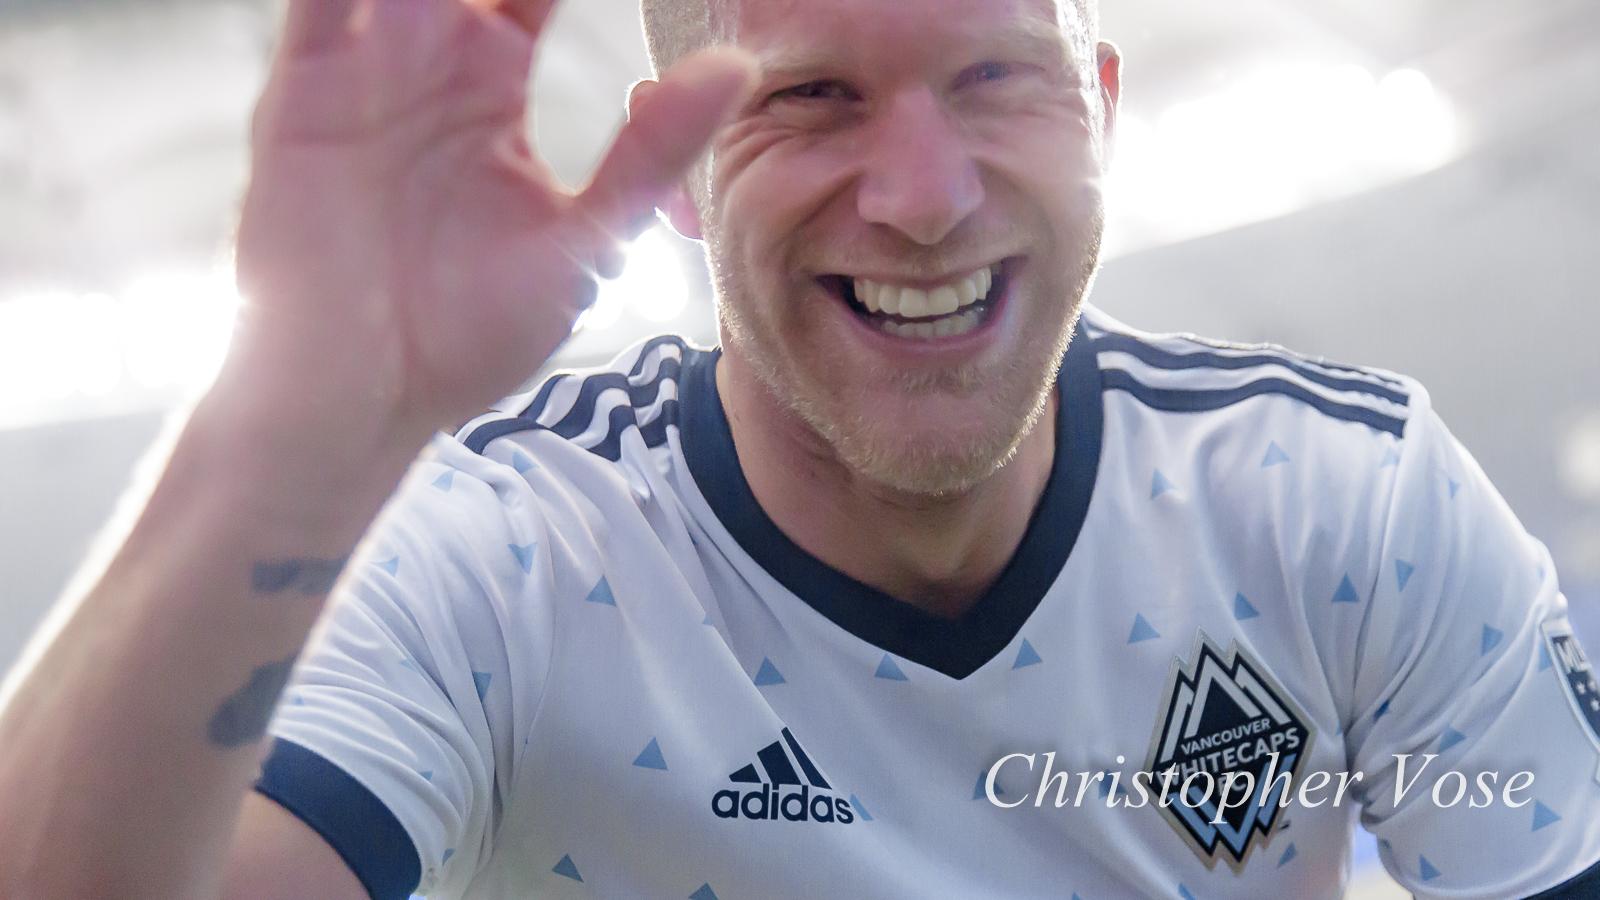 2017-10-25 Marcel de Jong Goal Reaction (Techera).jpg